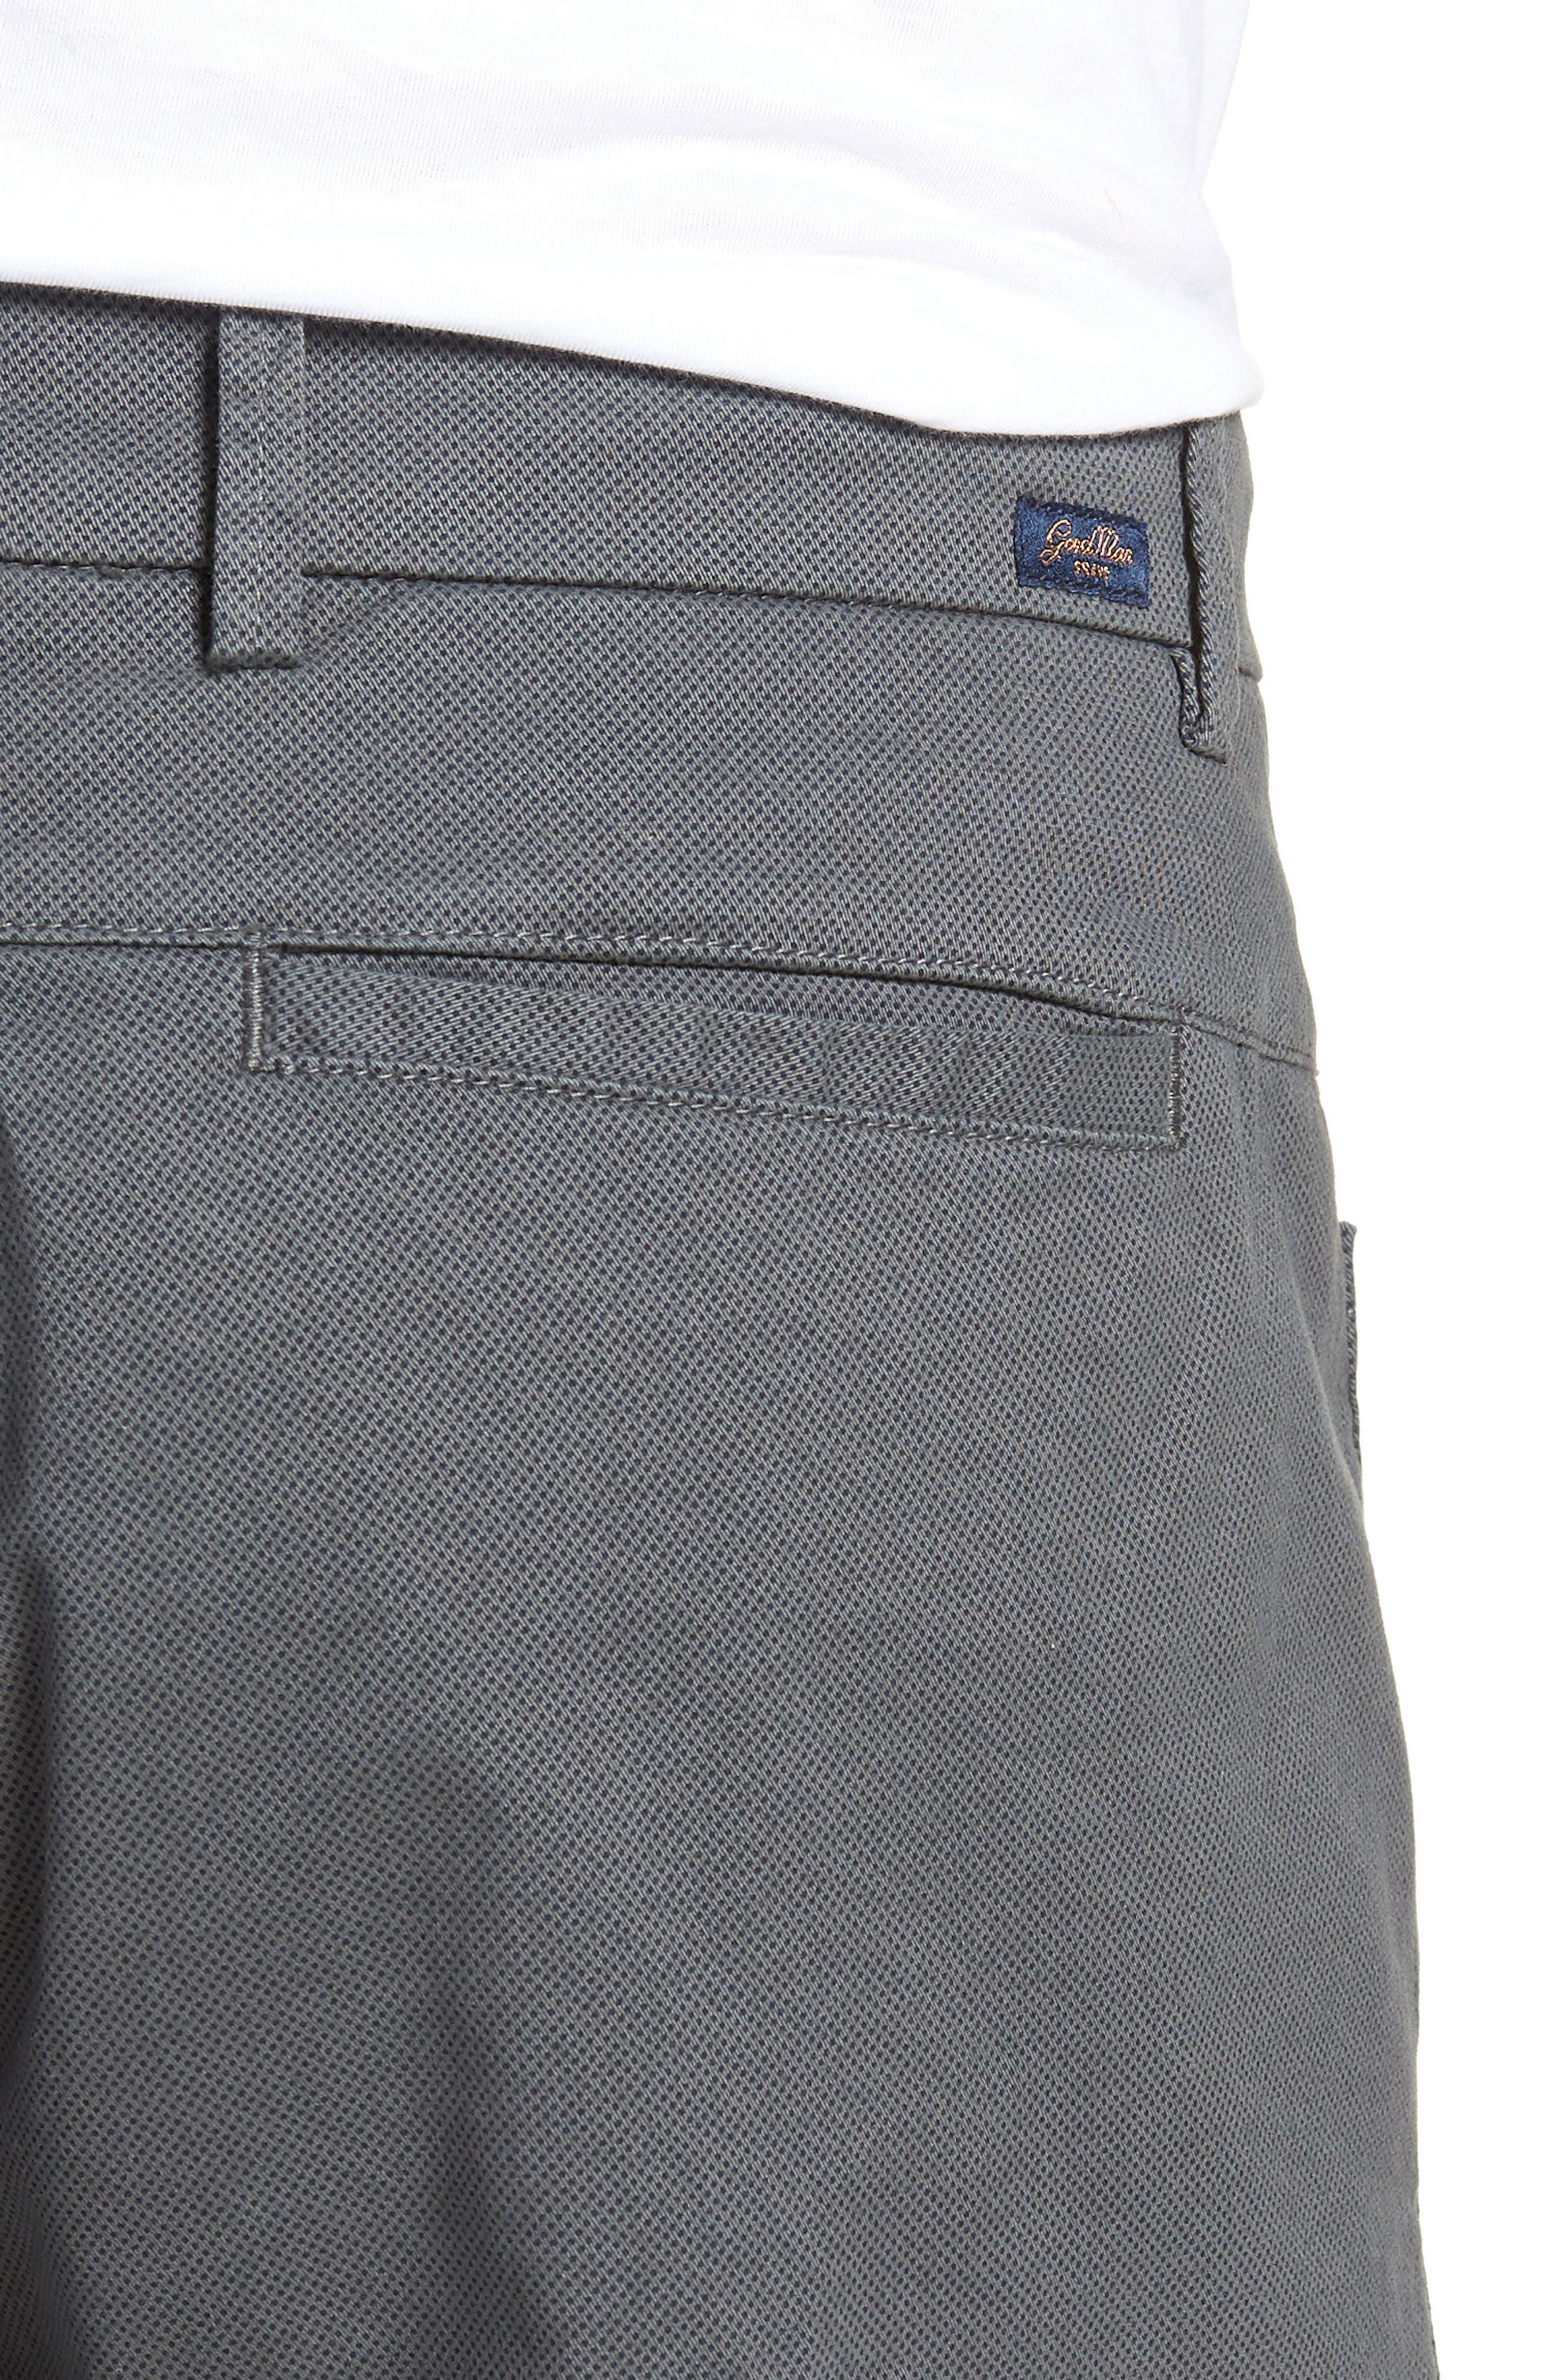 Wrap Microdot Stretch Chino Shorts,                             Alternate thumbnail 4, color,                             051